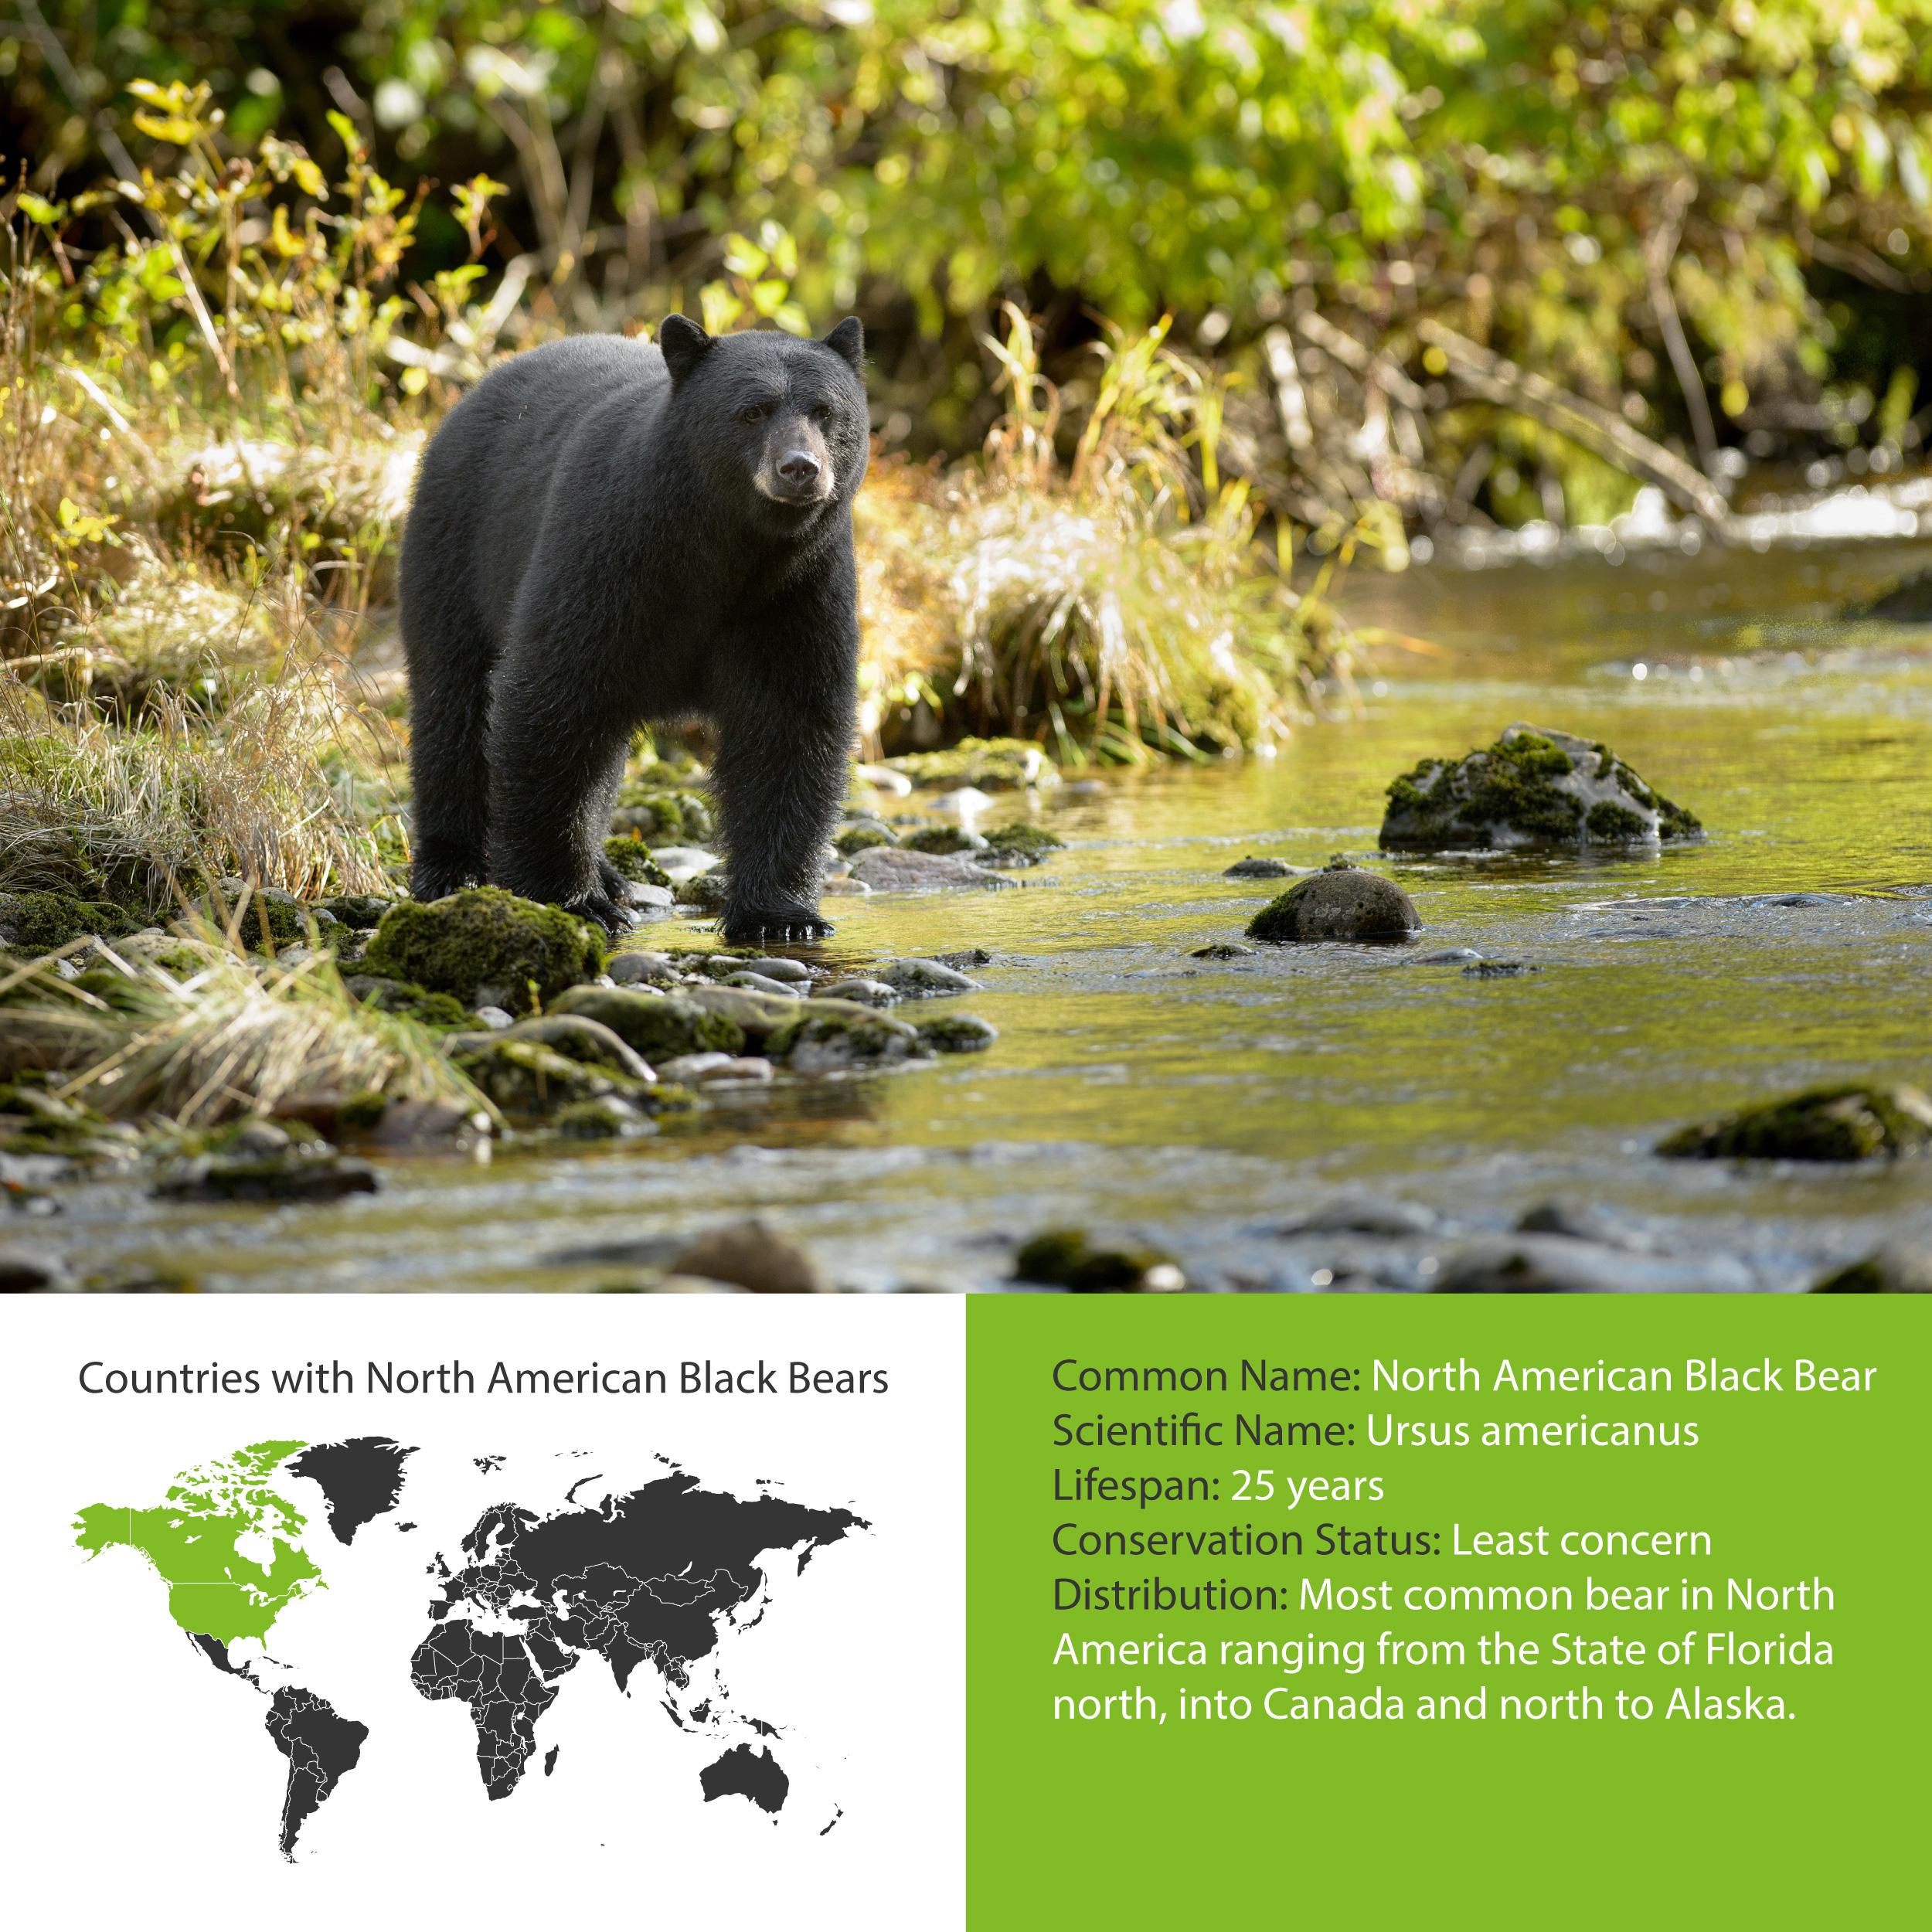 North American Black Bear Distribution